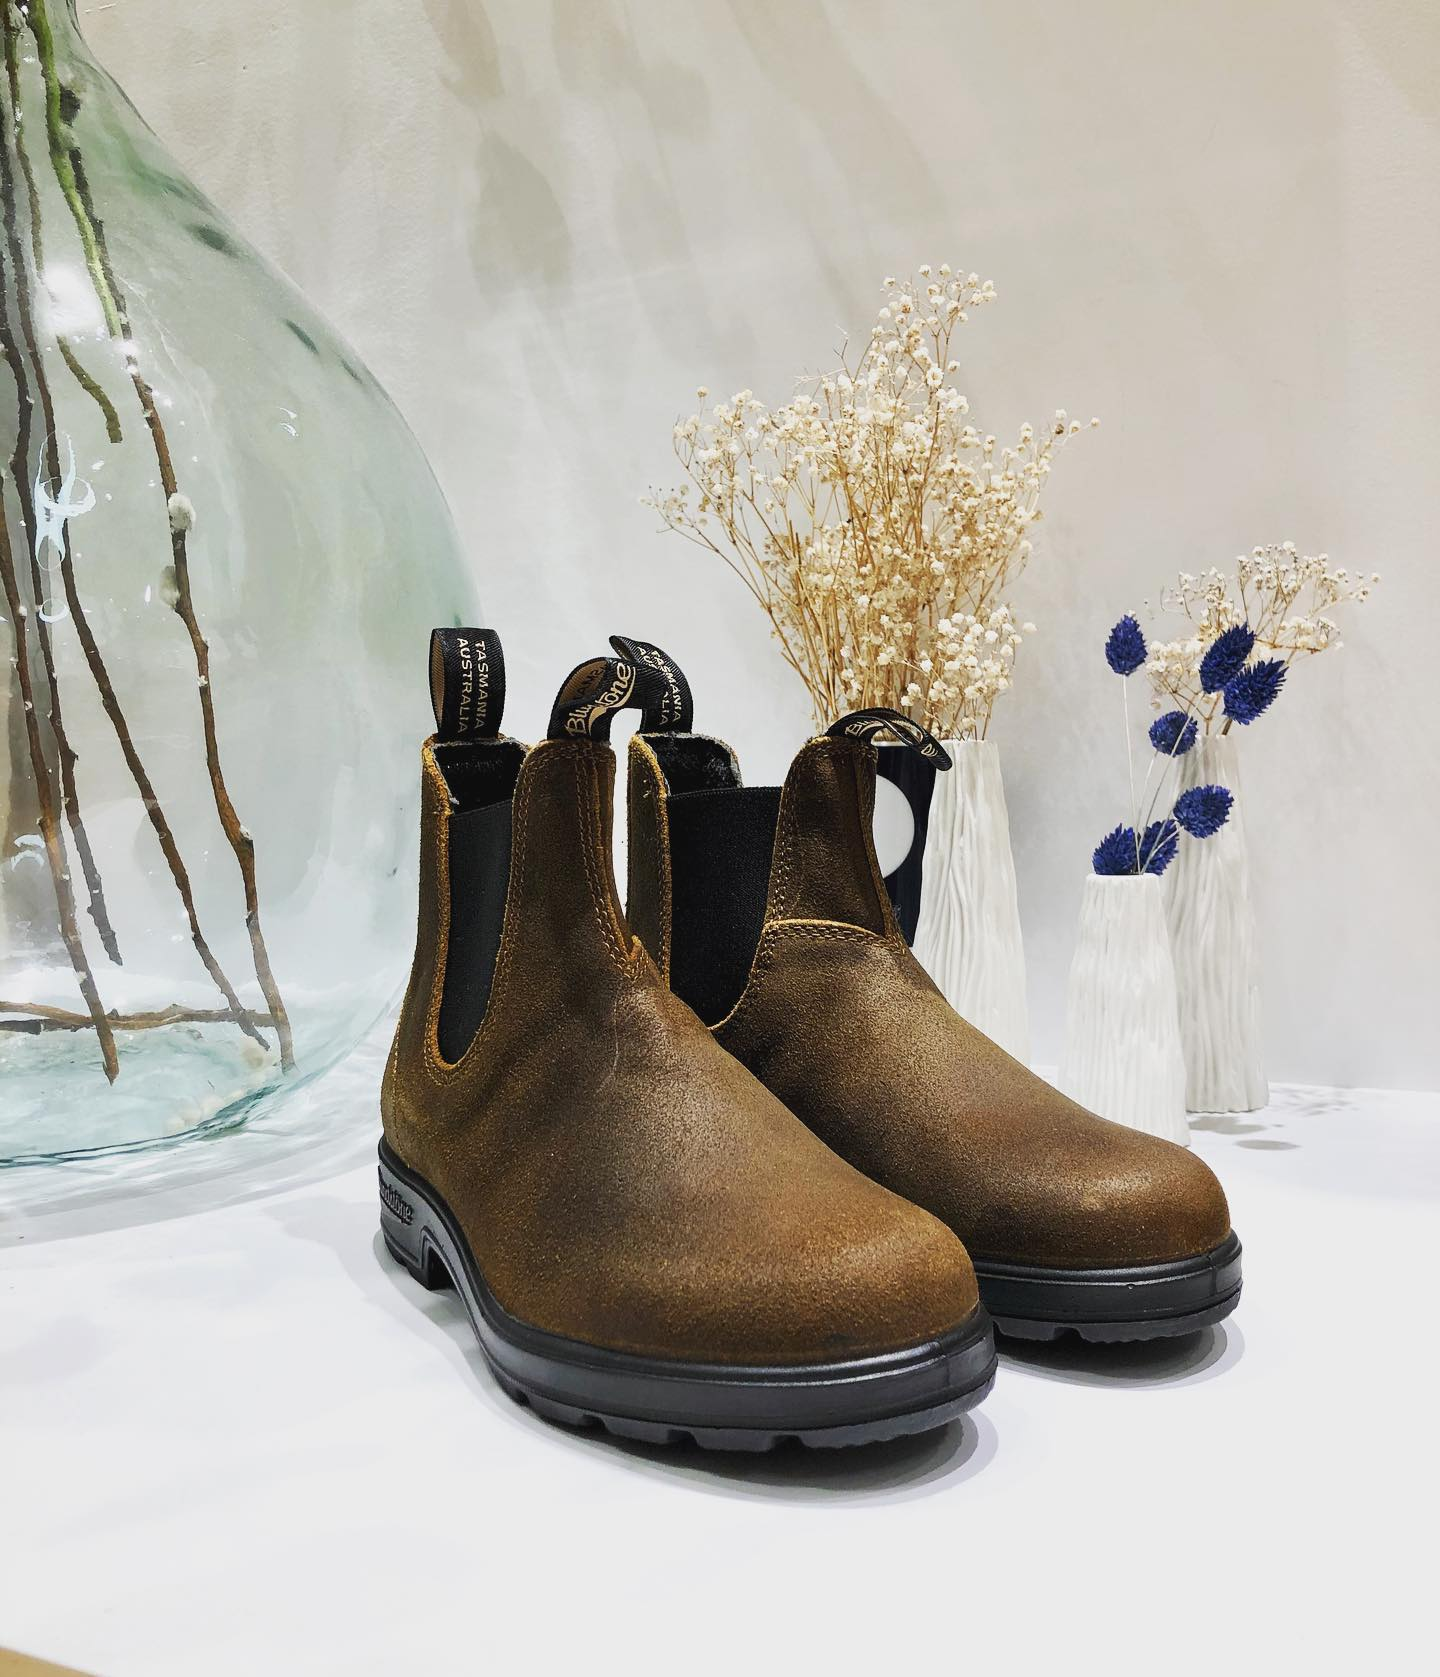 Les boots @blundstonefrance sont arrivées !!! @blundstonehttps://www.instagram.com/p/CGX2wVIF_pO/